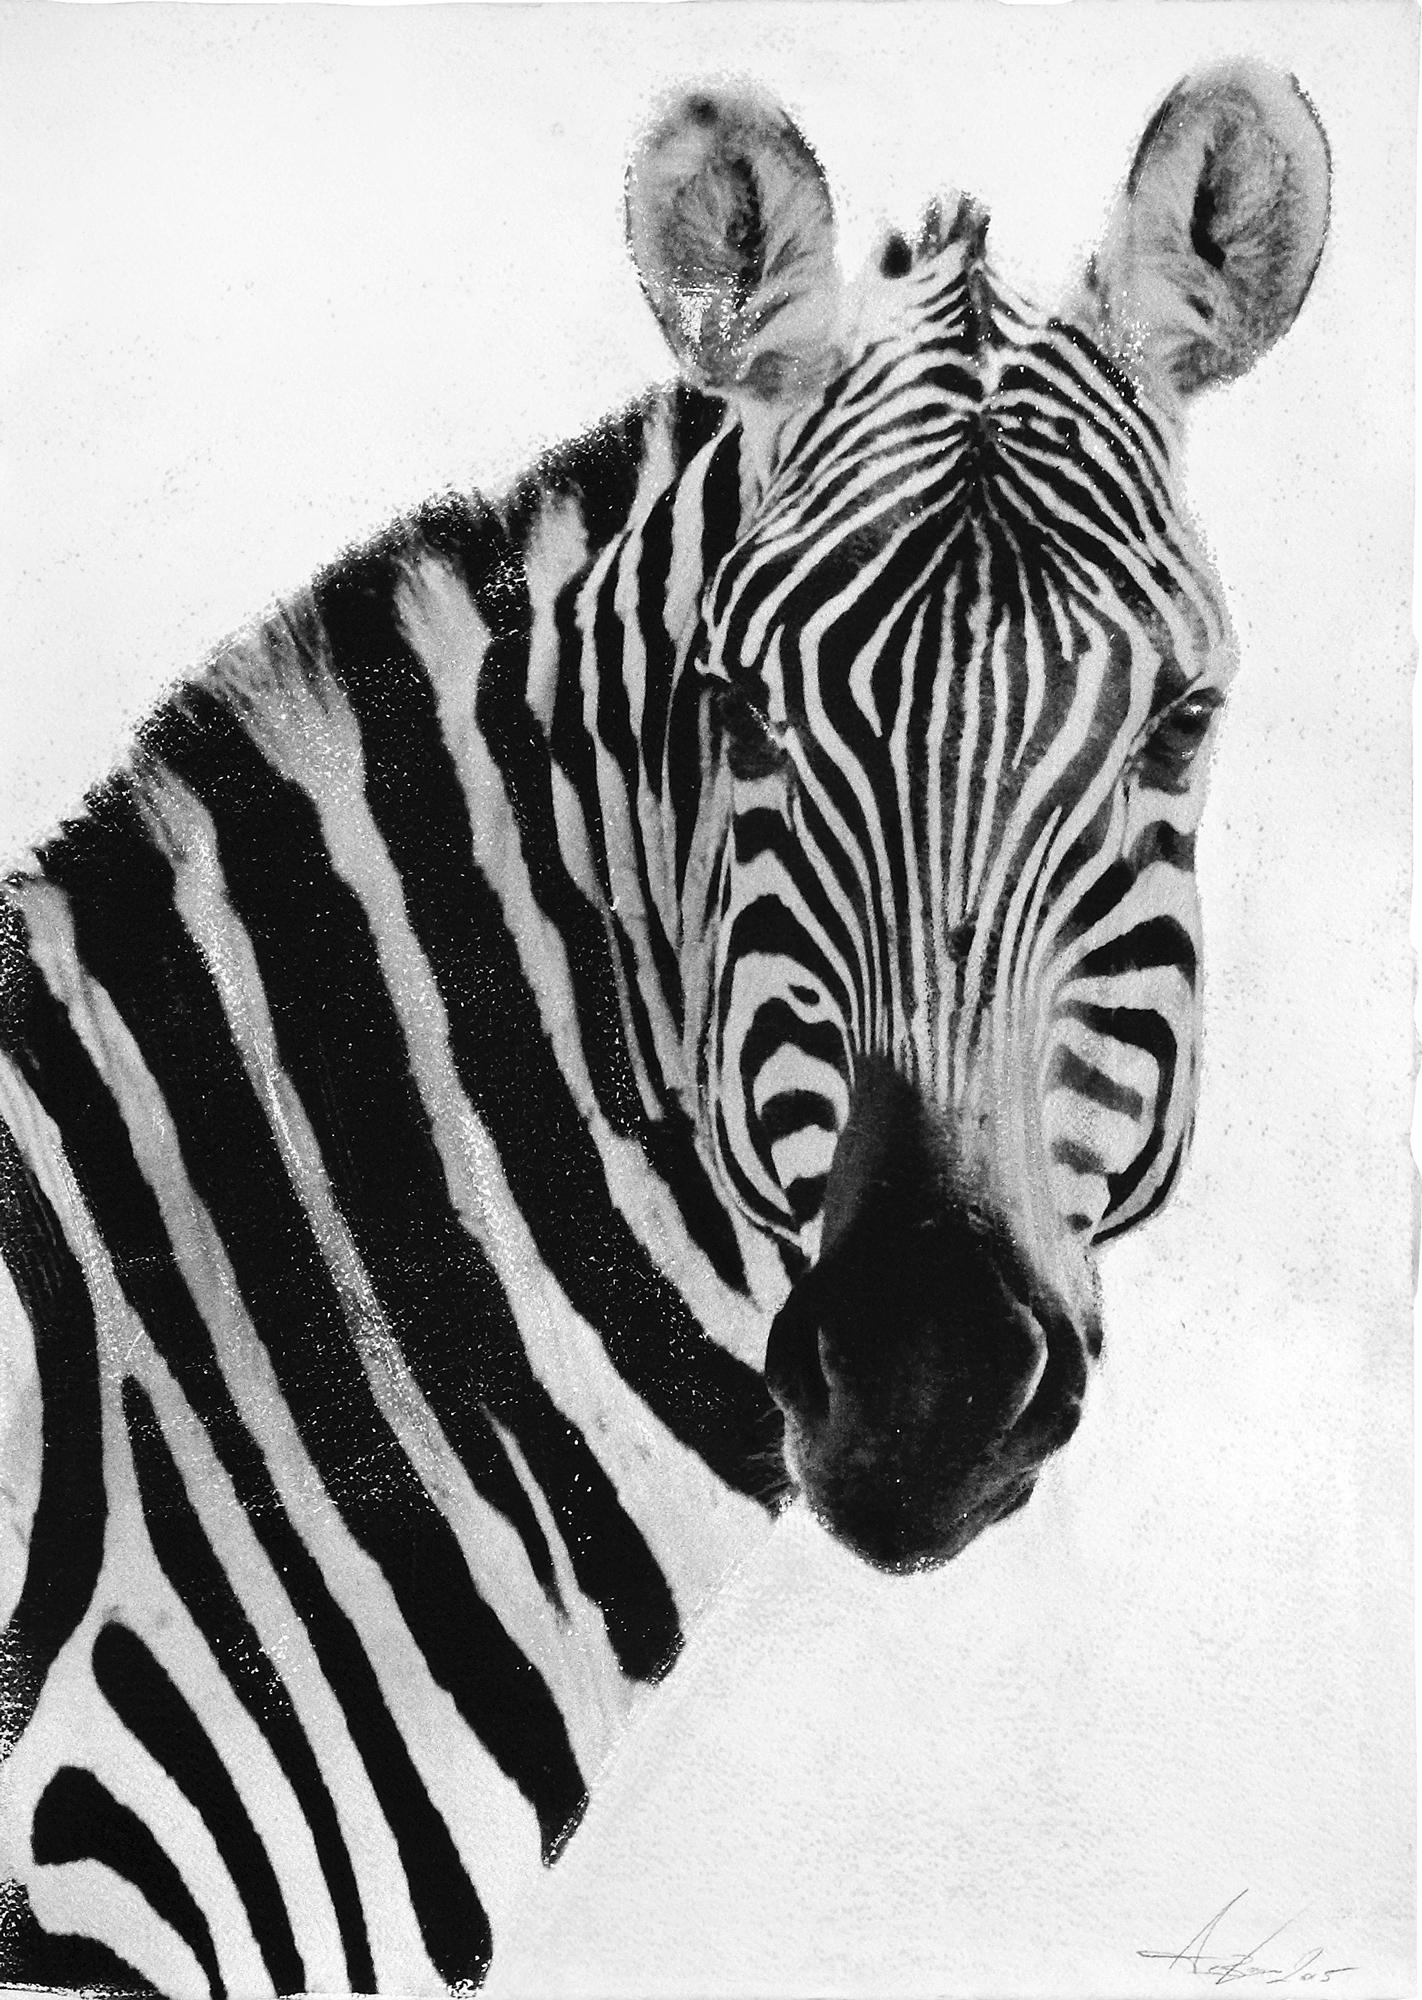 Zebra, 2015